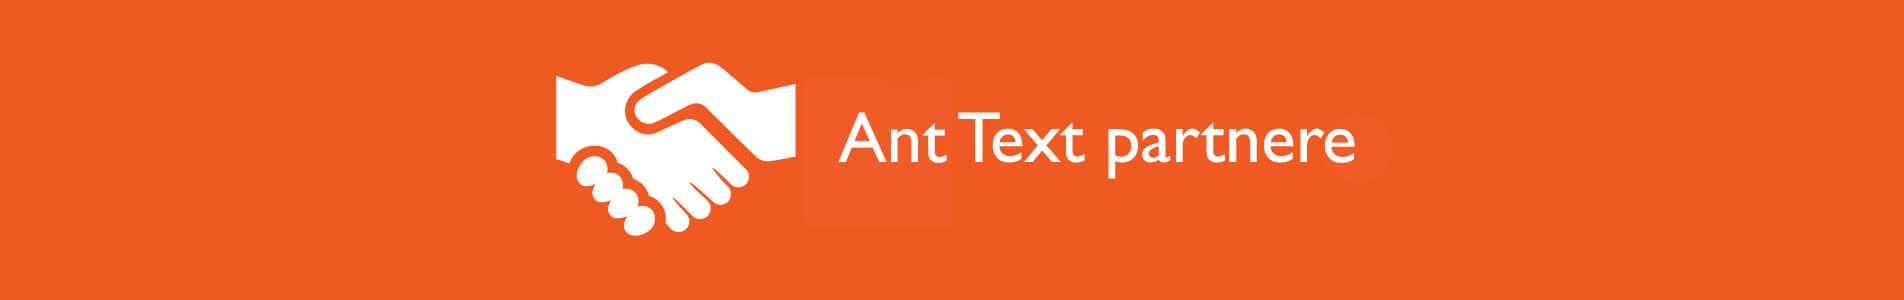 Header Ant Text partnere